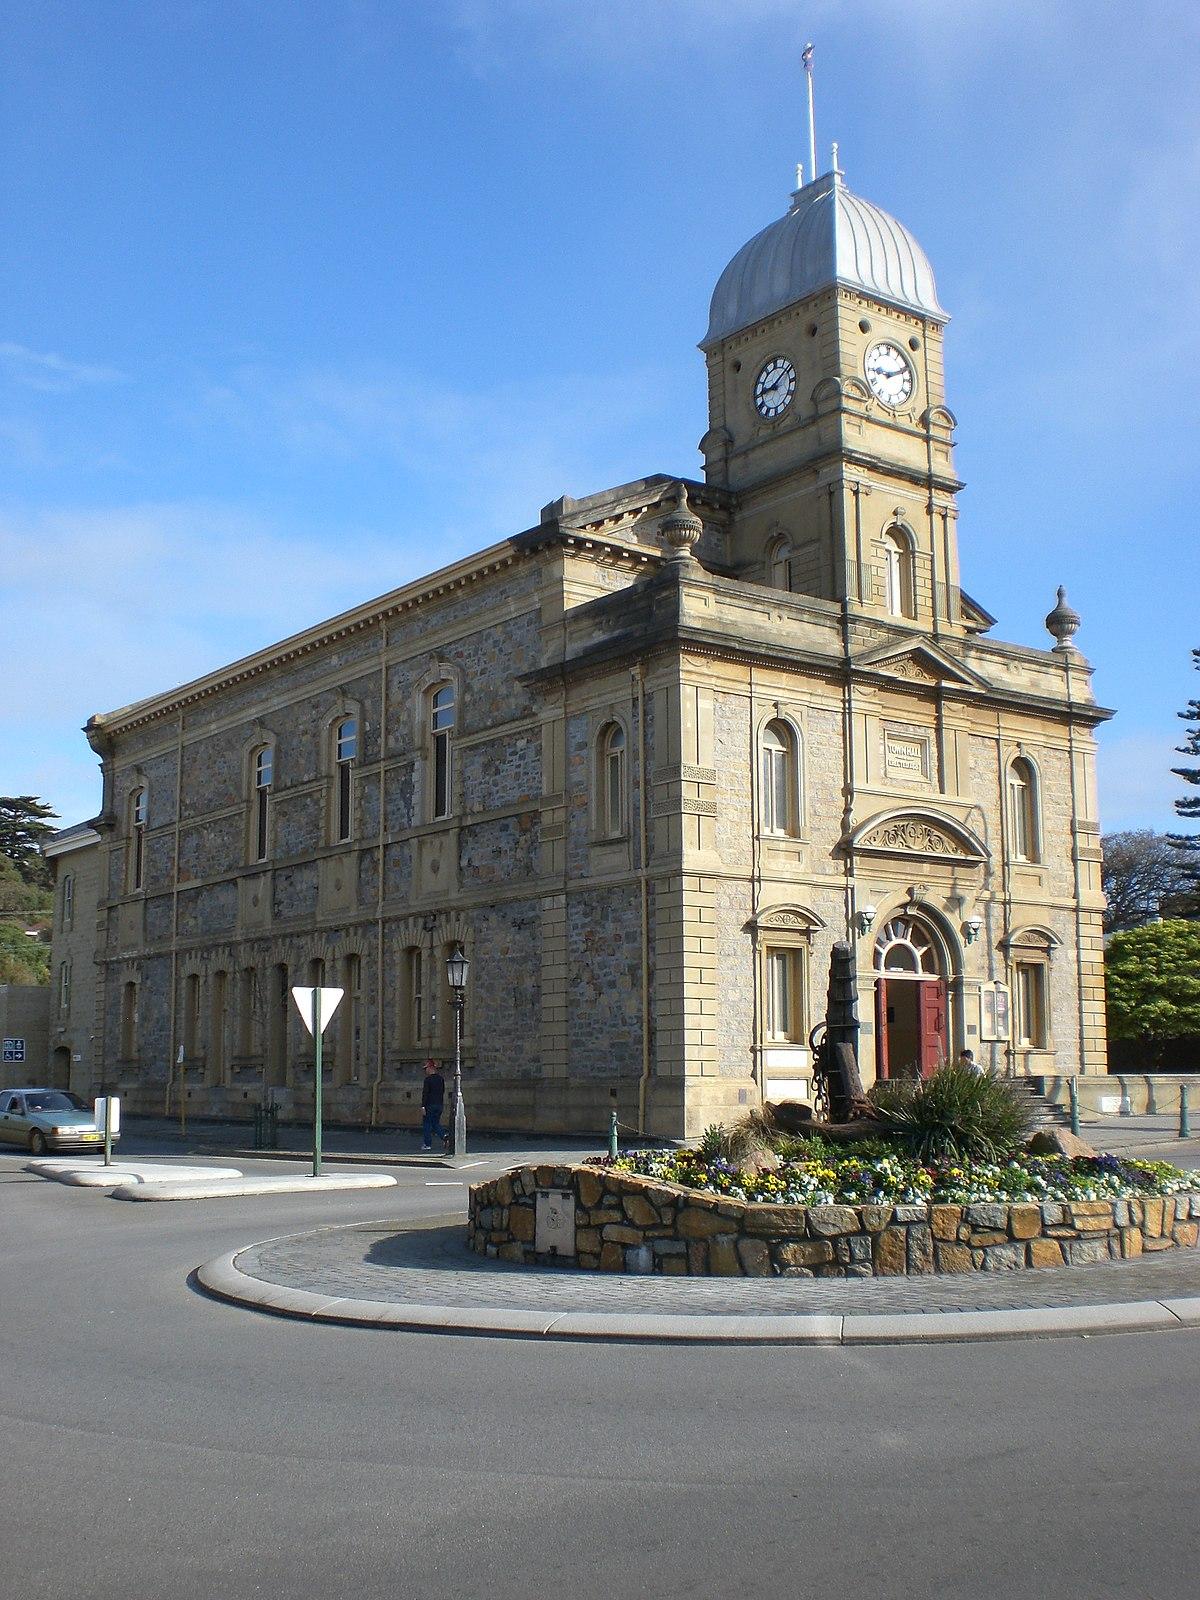 Albany Town Hall (Western Australia)